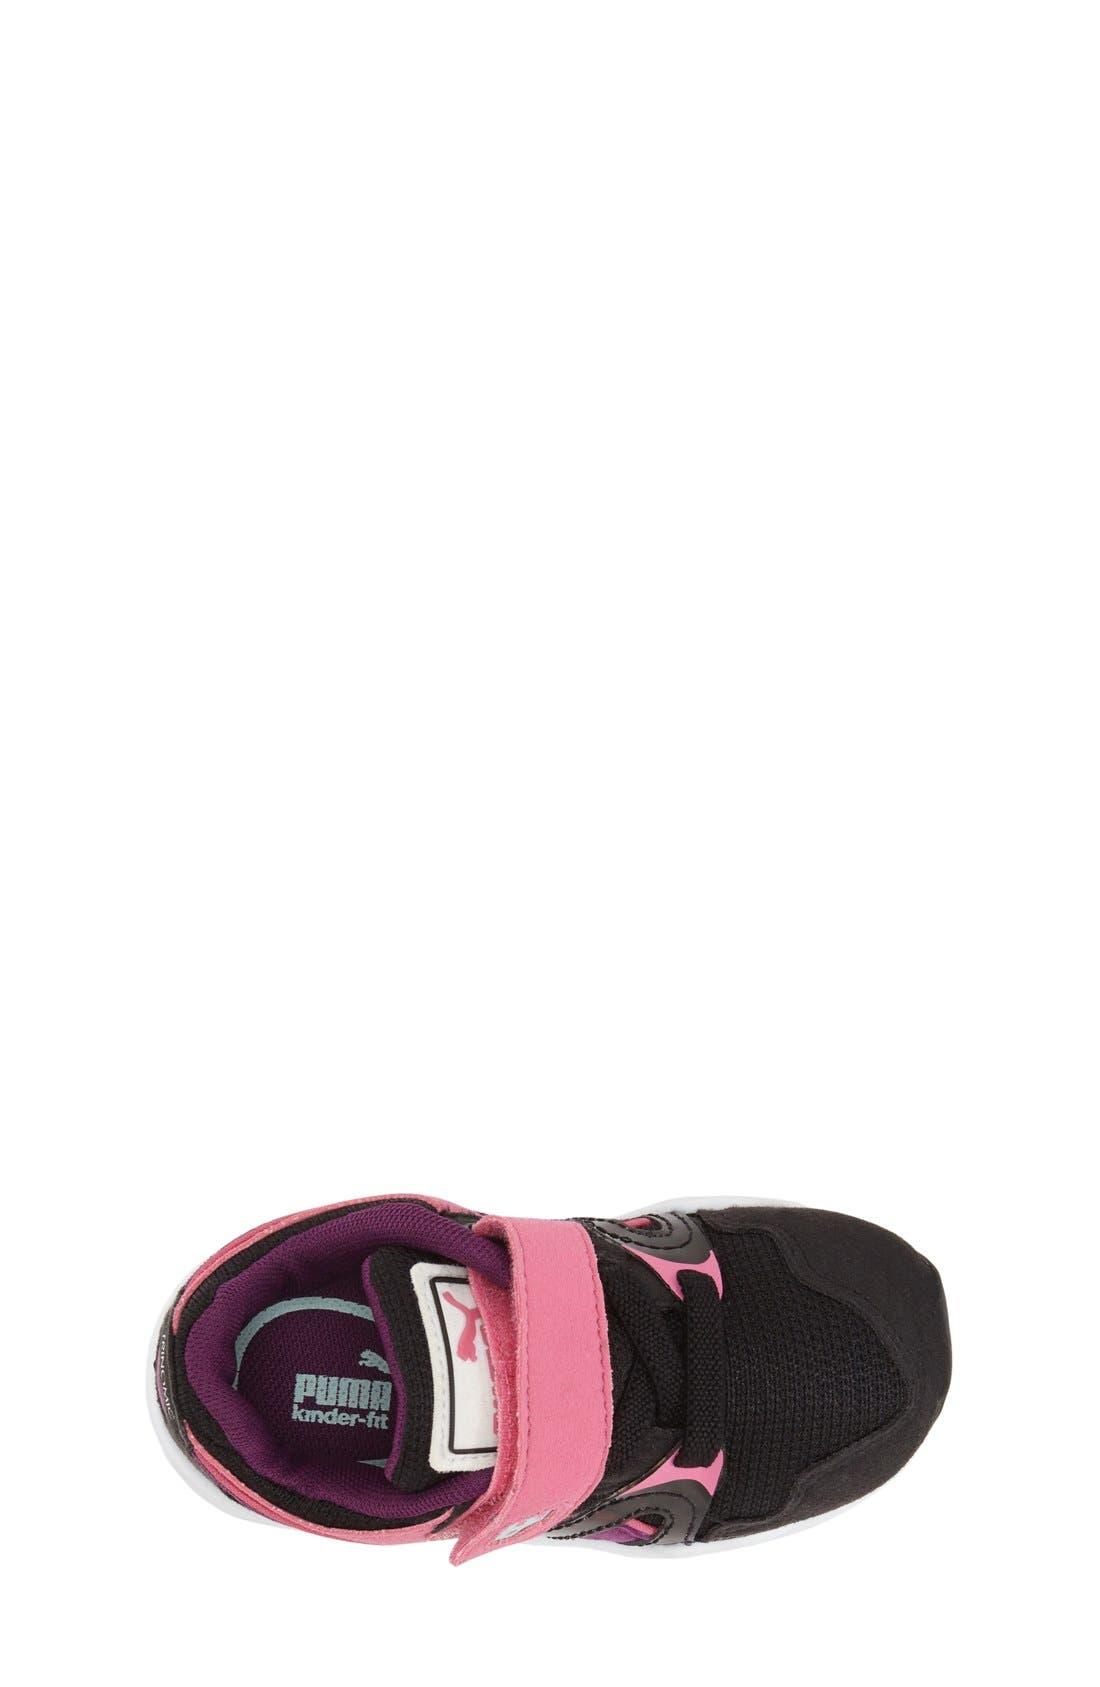 Alternate Image 3  - PUMA 'Trinomic XT1 Plus V' Sneaker (Baby, Walker, Toddler, Little Kid & Big Kid)